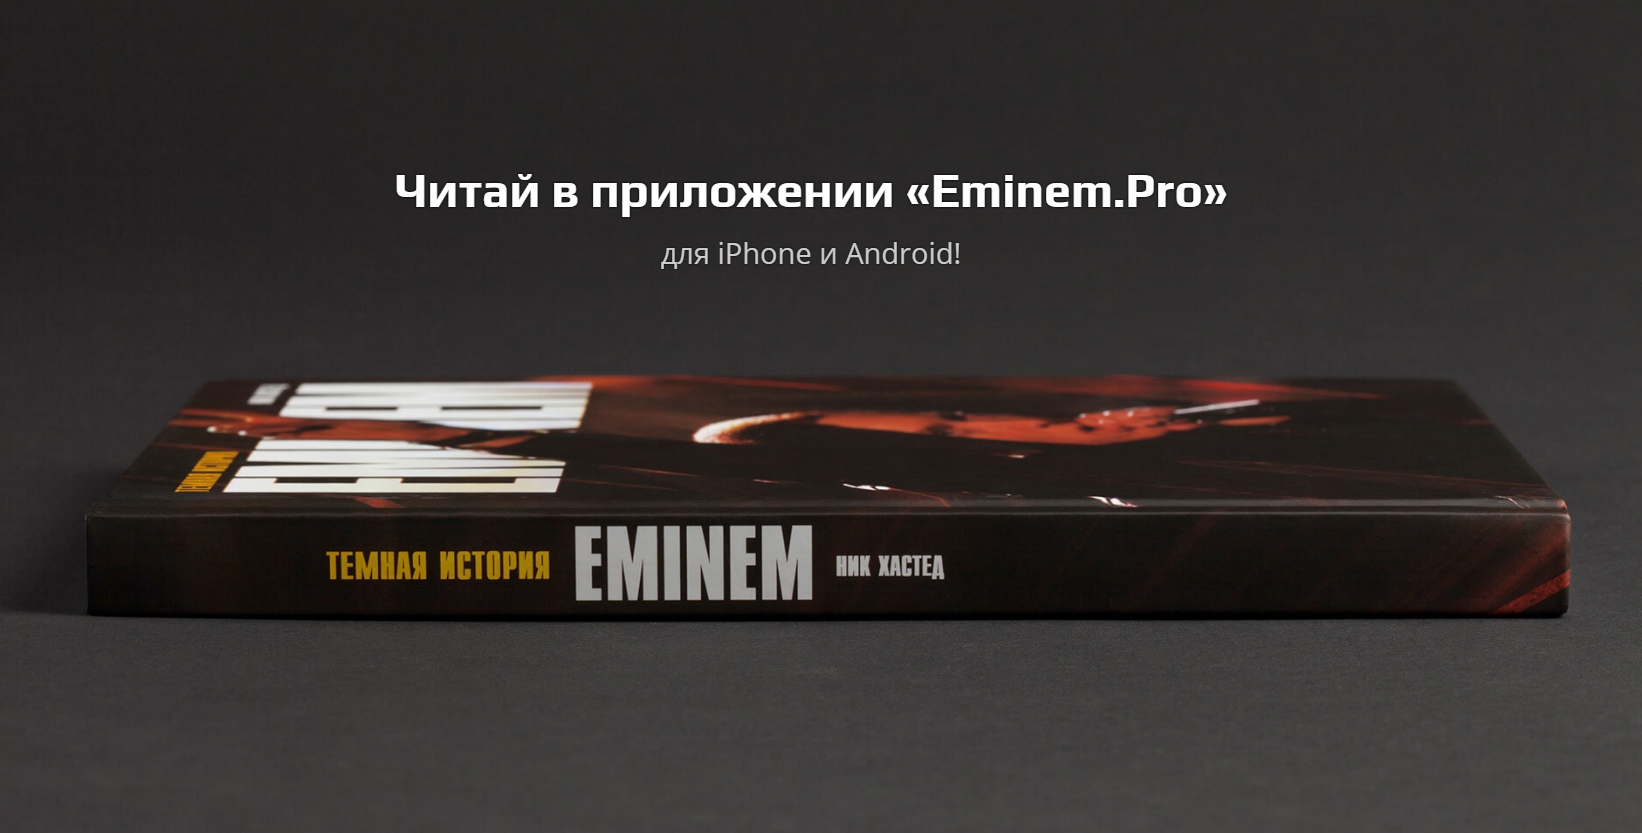 Eminem.Pro и EminemBook представляют: Книга «Eminem. Тёмная история» в приложении ePro!